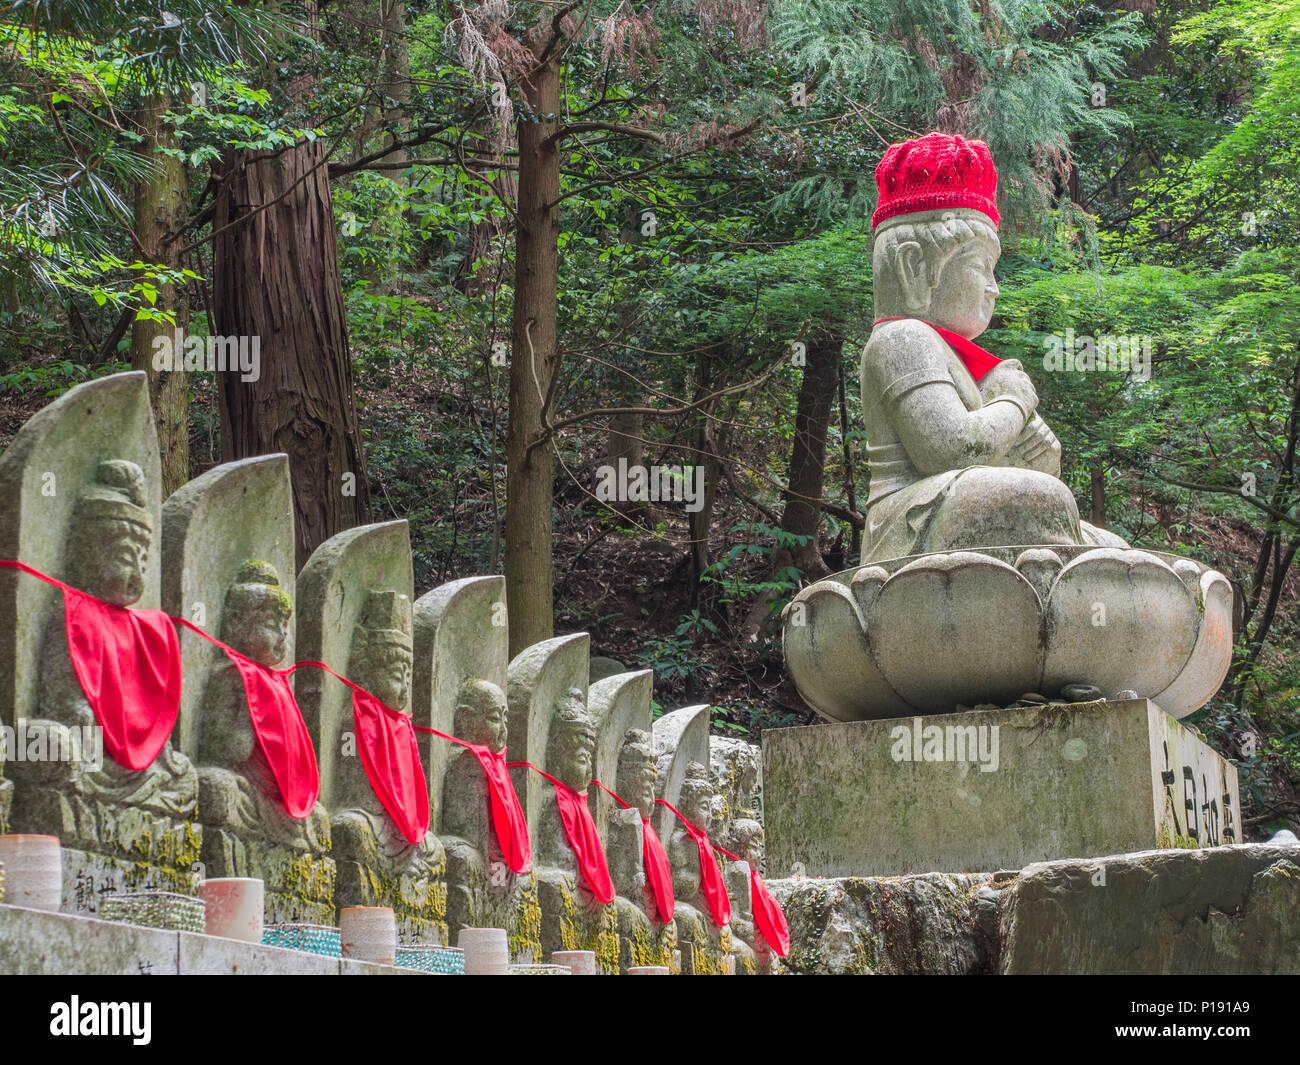 Buddhist deities, statues with red bibs, Taisanji temple 52,  Shikoku 88 Temple  pilgrimage,   Ehime, Japan. - Stock Image